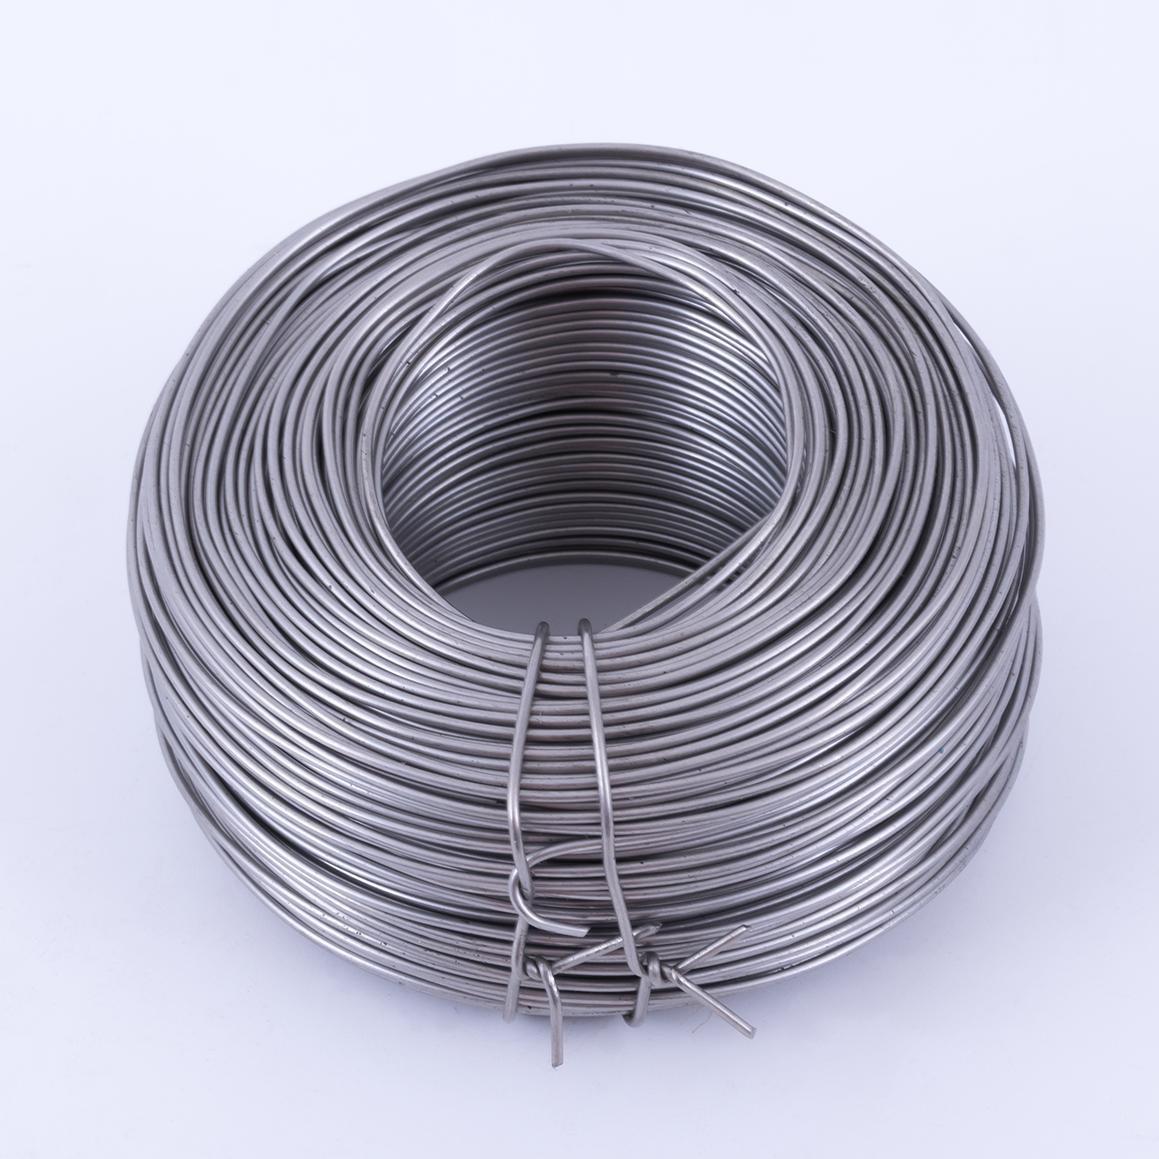 Tie Wire Gauges : Stainless steel tying wire